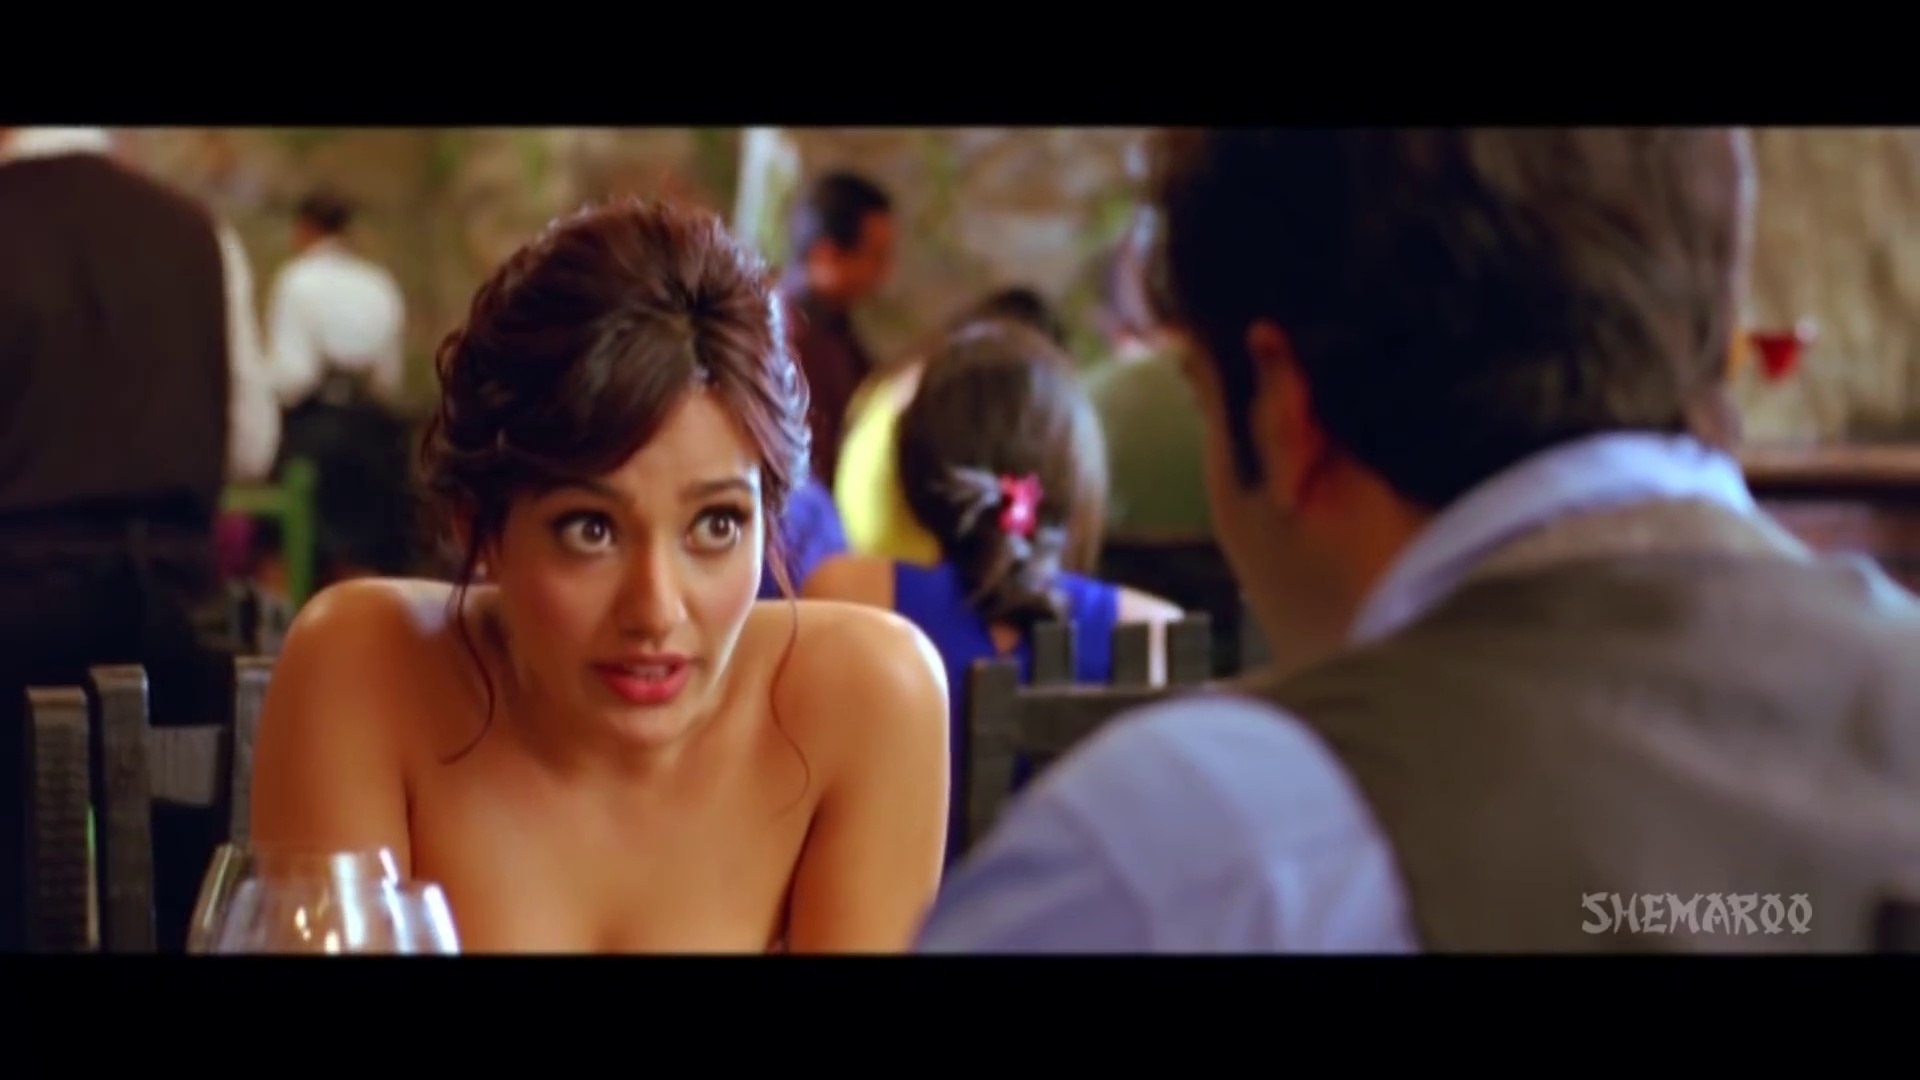 neha sharma private video  __Kyaa Super Kool Hain Hum Comedy Scene - Tusshar Kapoor